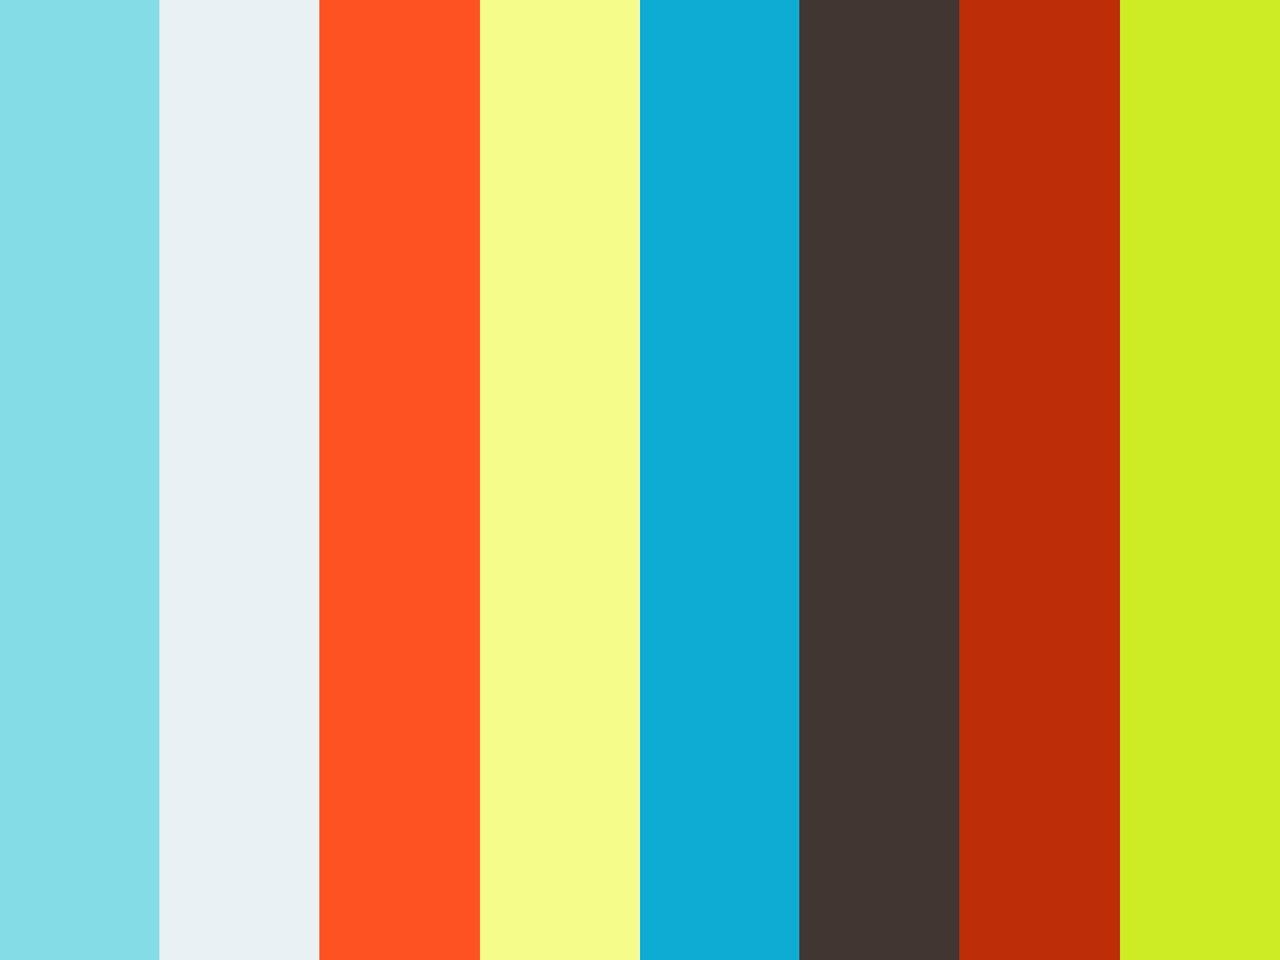 FYI_OCI_10.14.14.mov